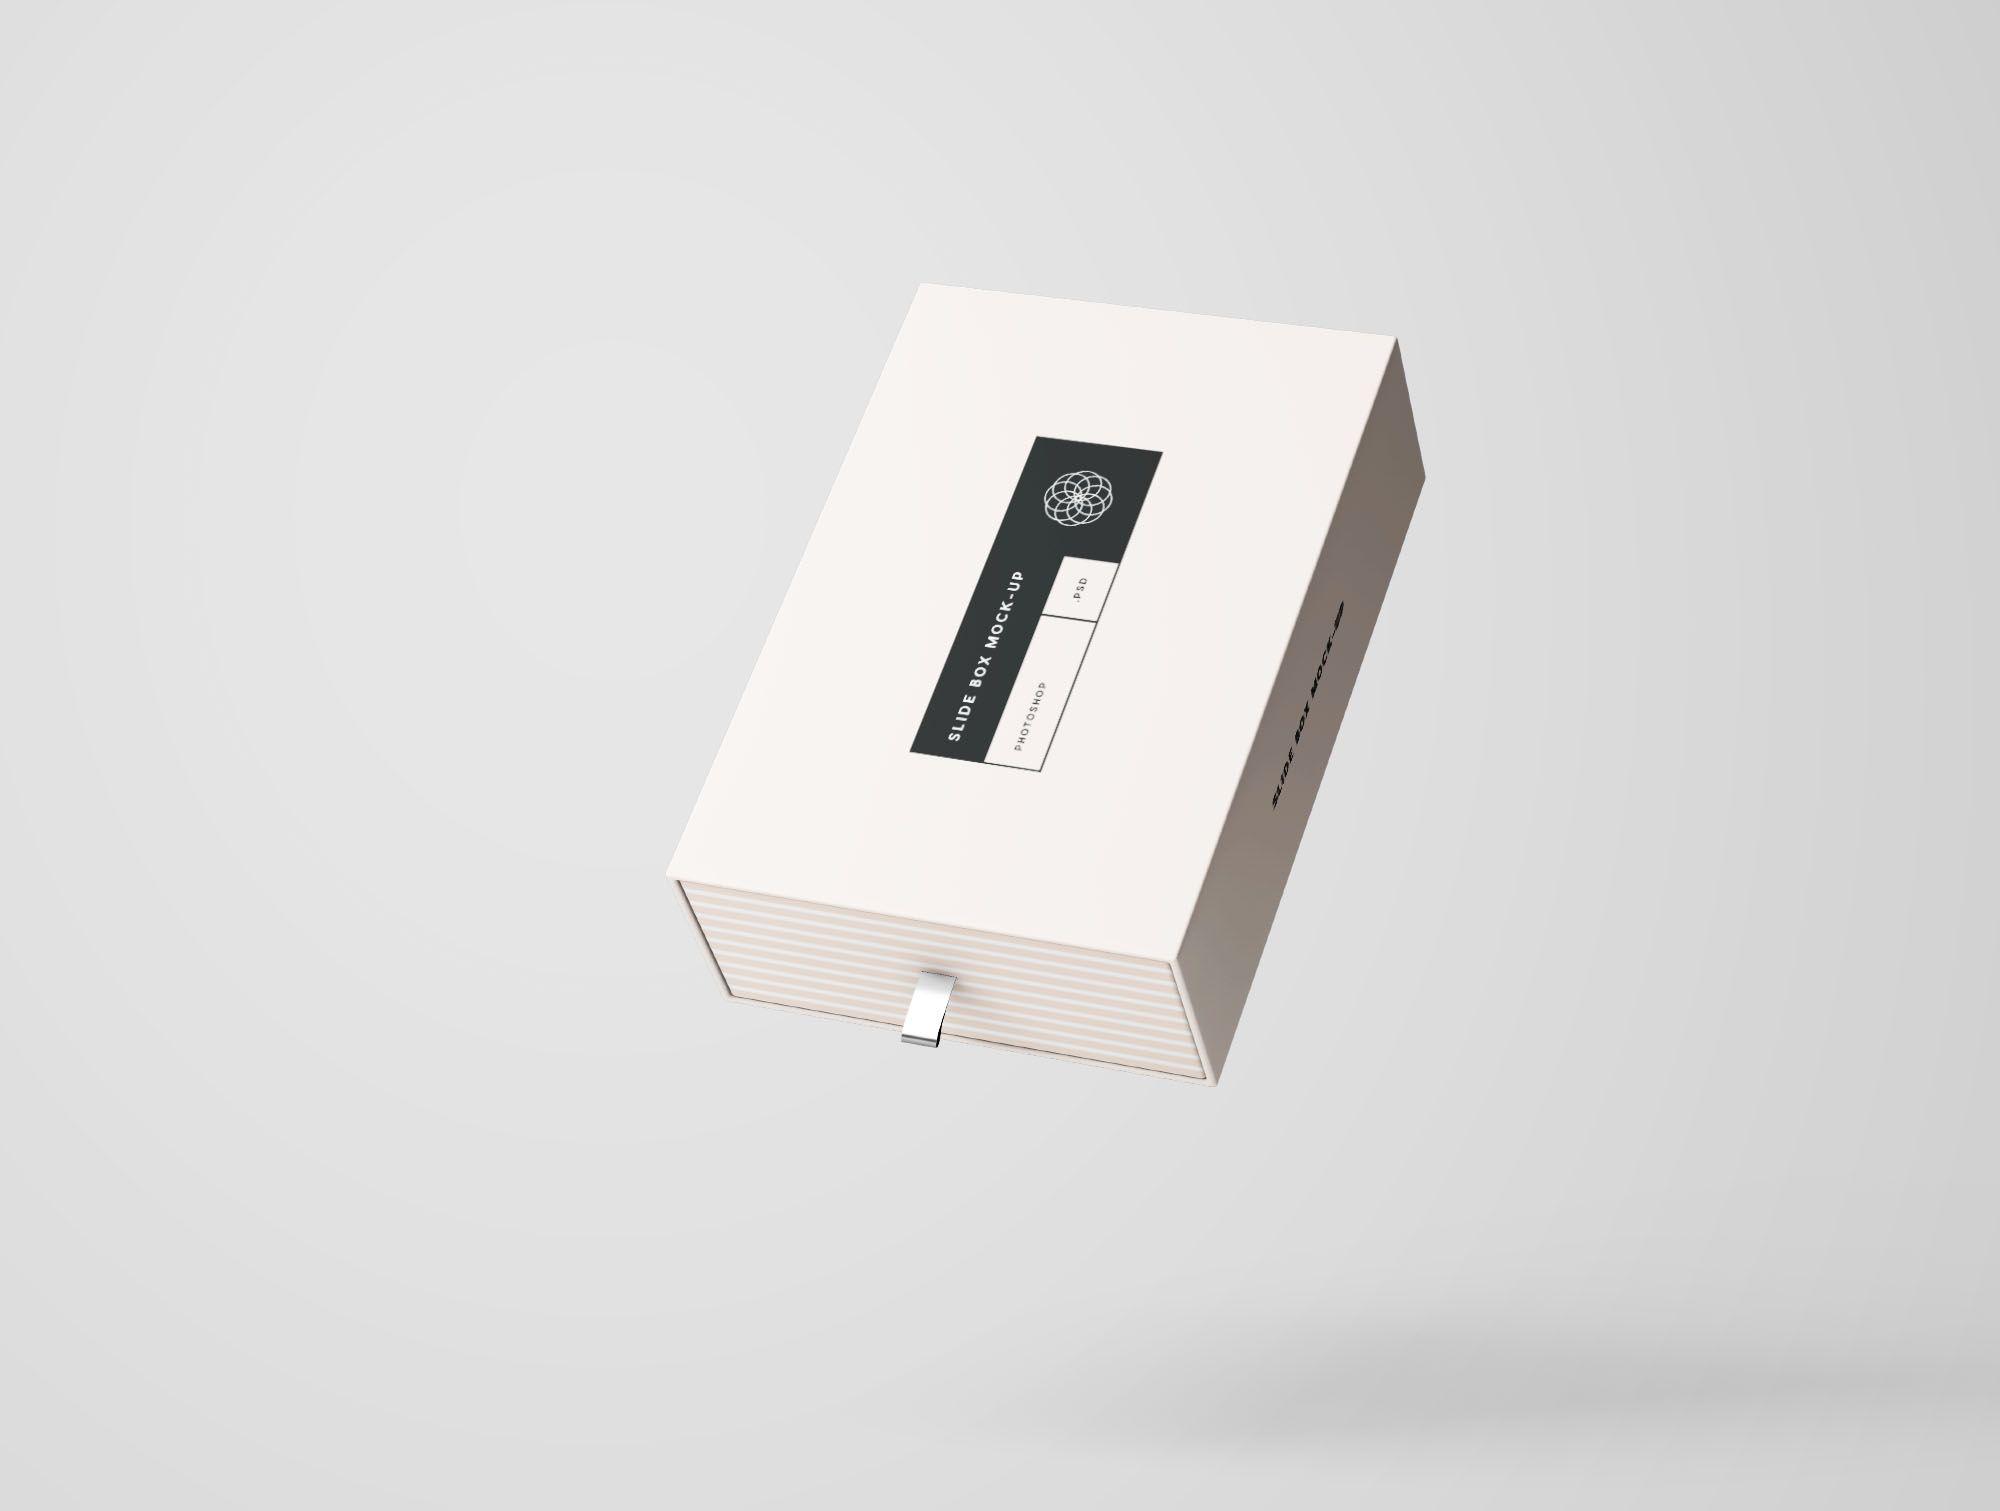 Download Rectangle Slide Box Mockup Slide Box Box Mockup Mockup